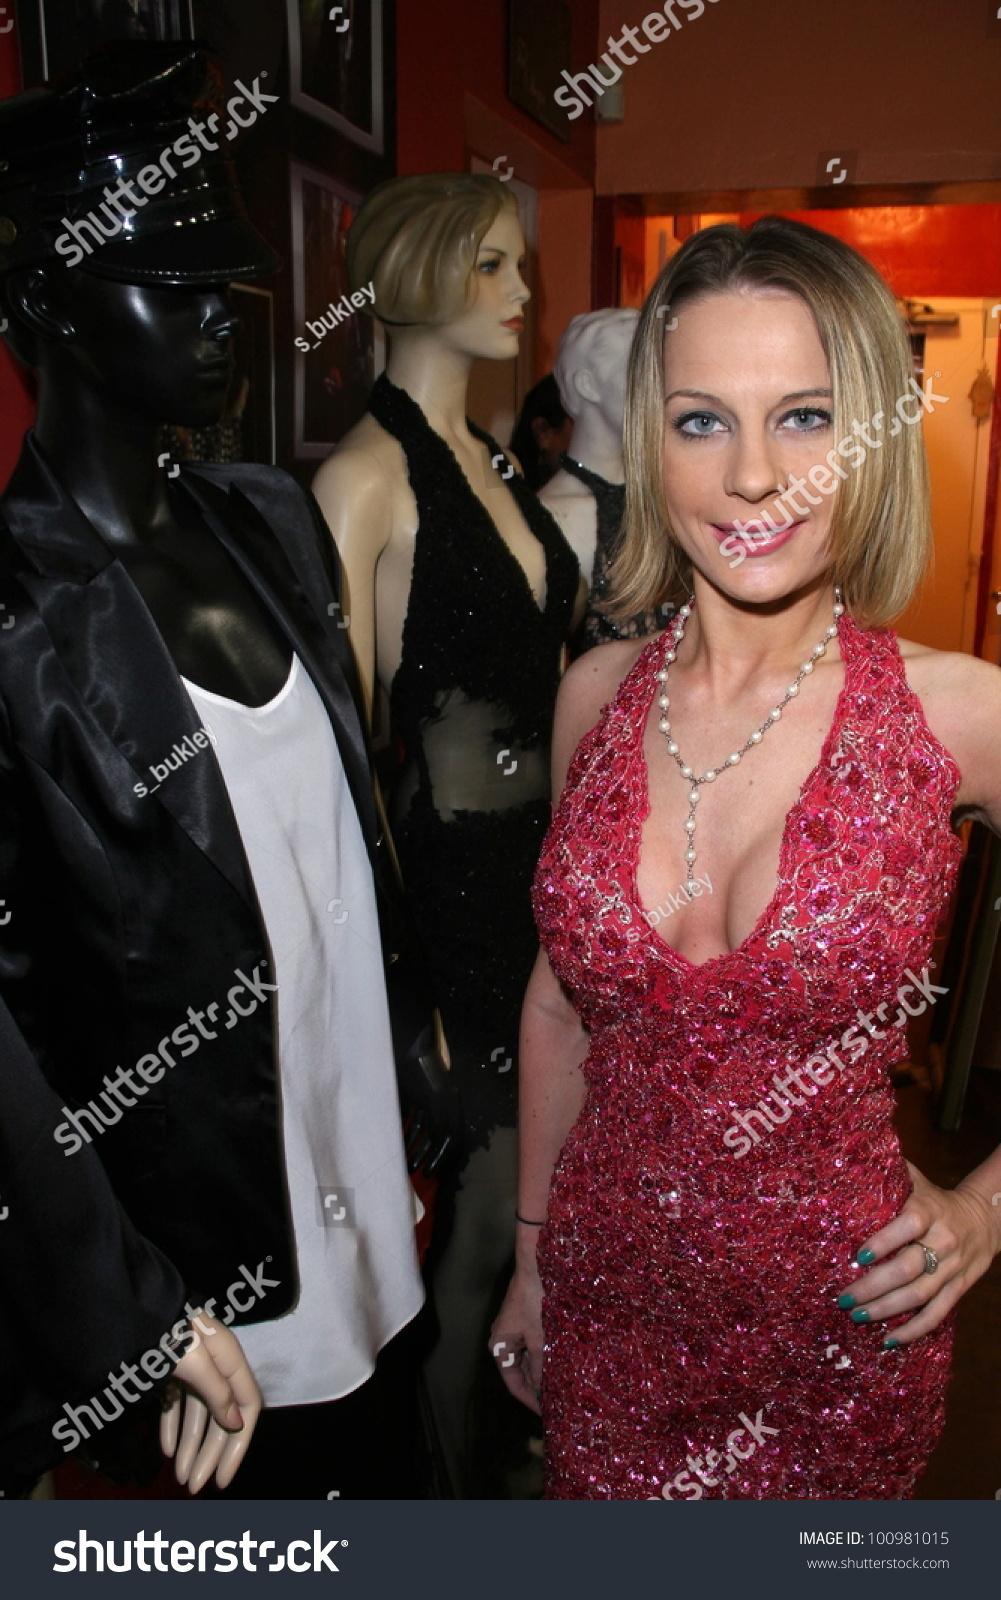 Alejandra Prado Nude Photos 34